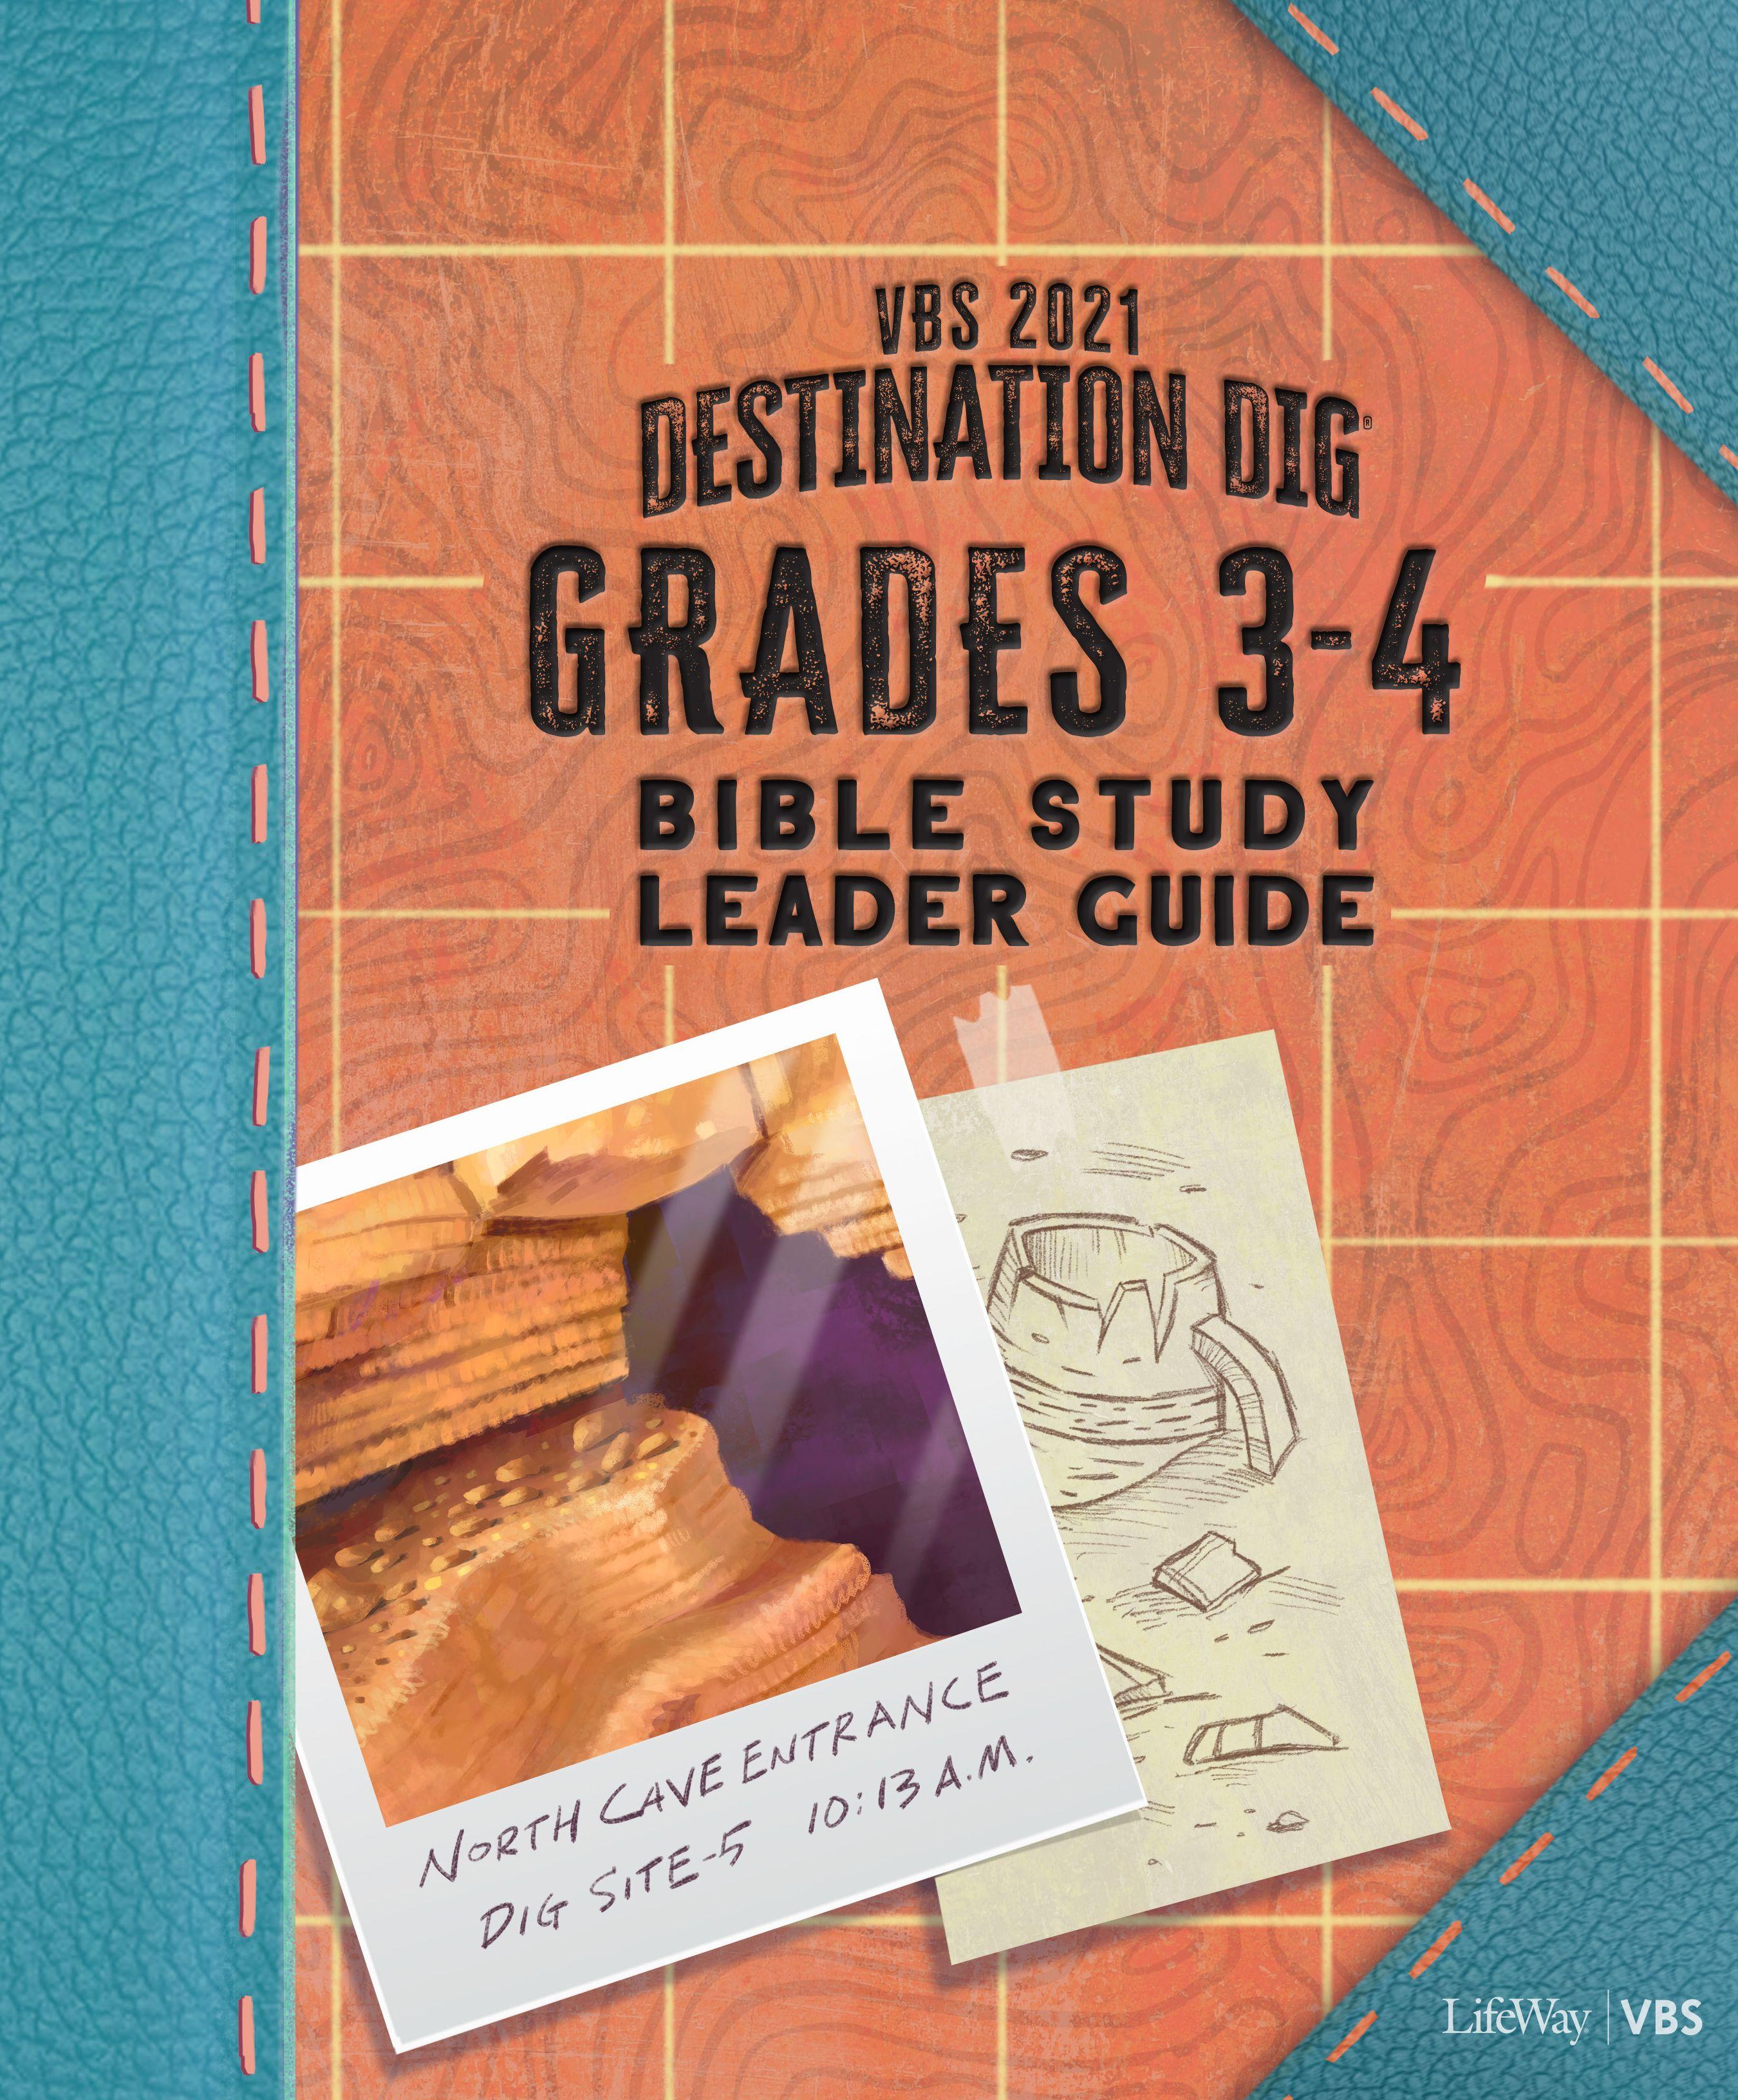 Grades 3-4 Leader Guide